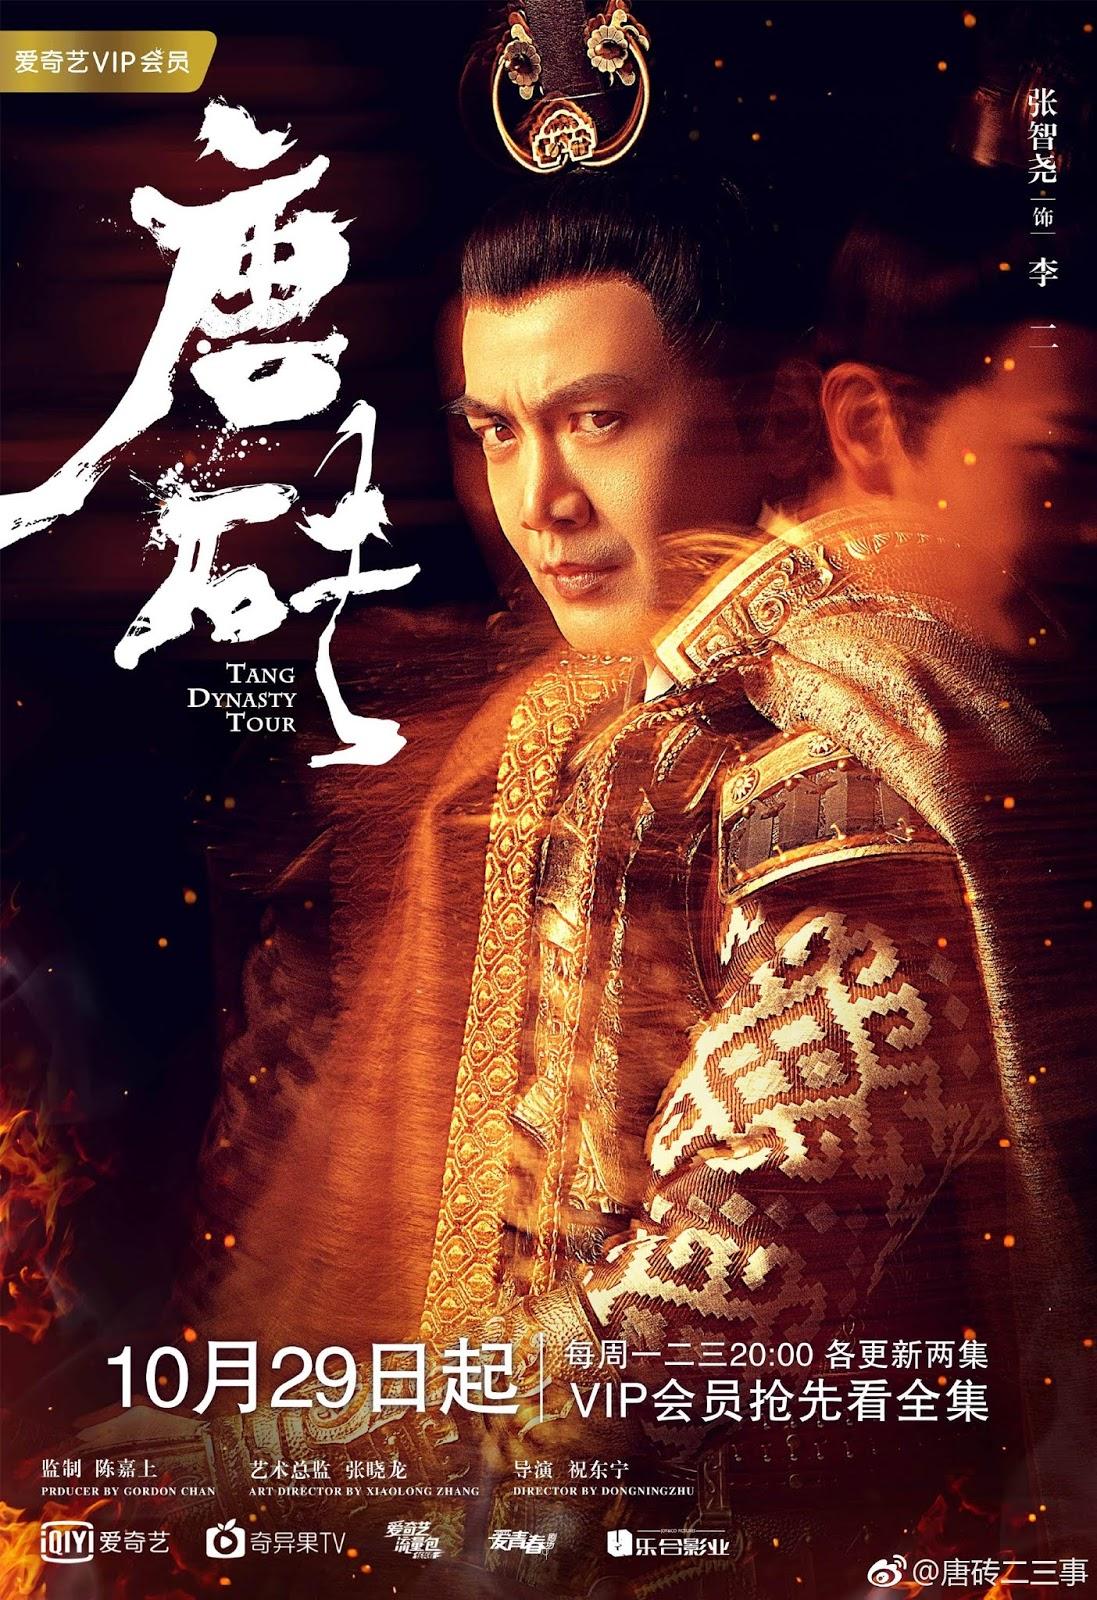 Tang Dynasty Tour (2018) - DramaPanda